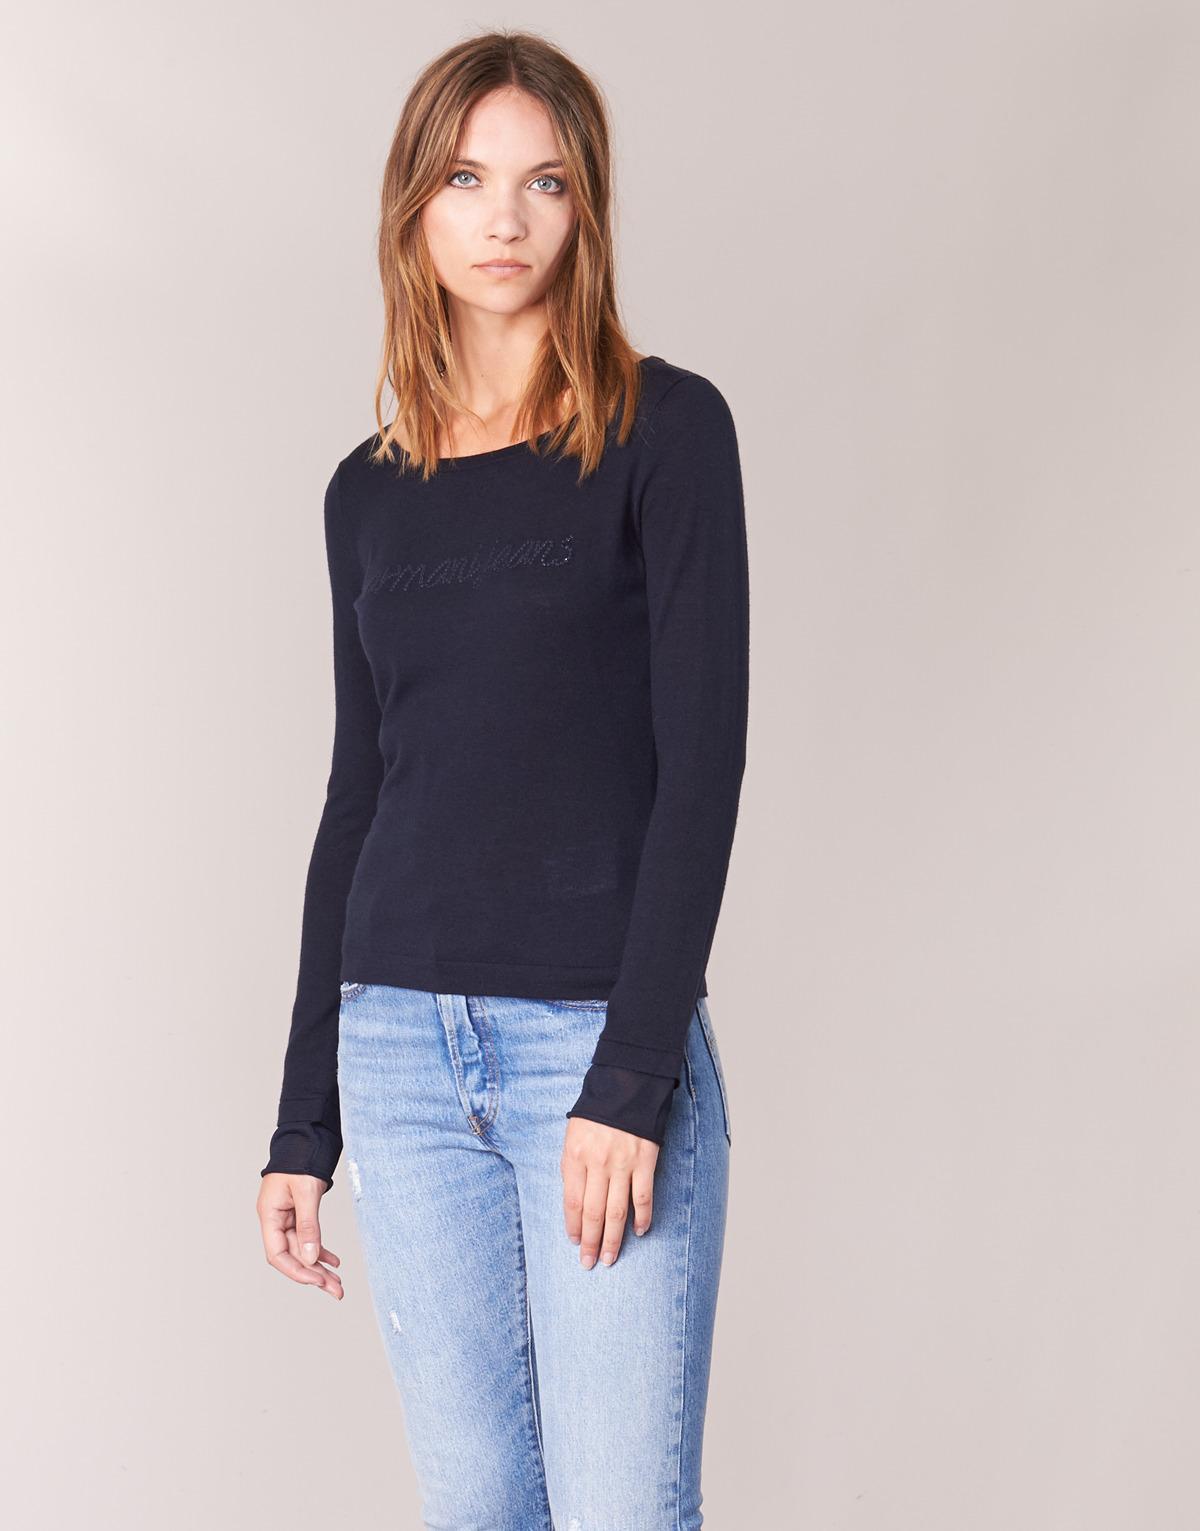 f2d3fb1532 Armani Jeans Jauda Women s Sweater In Blue in Blue - Lyst